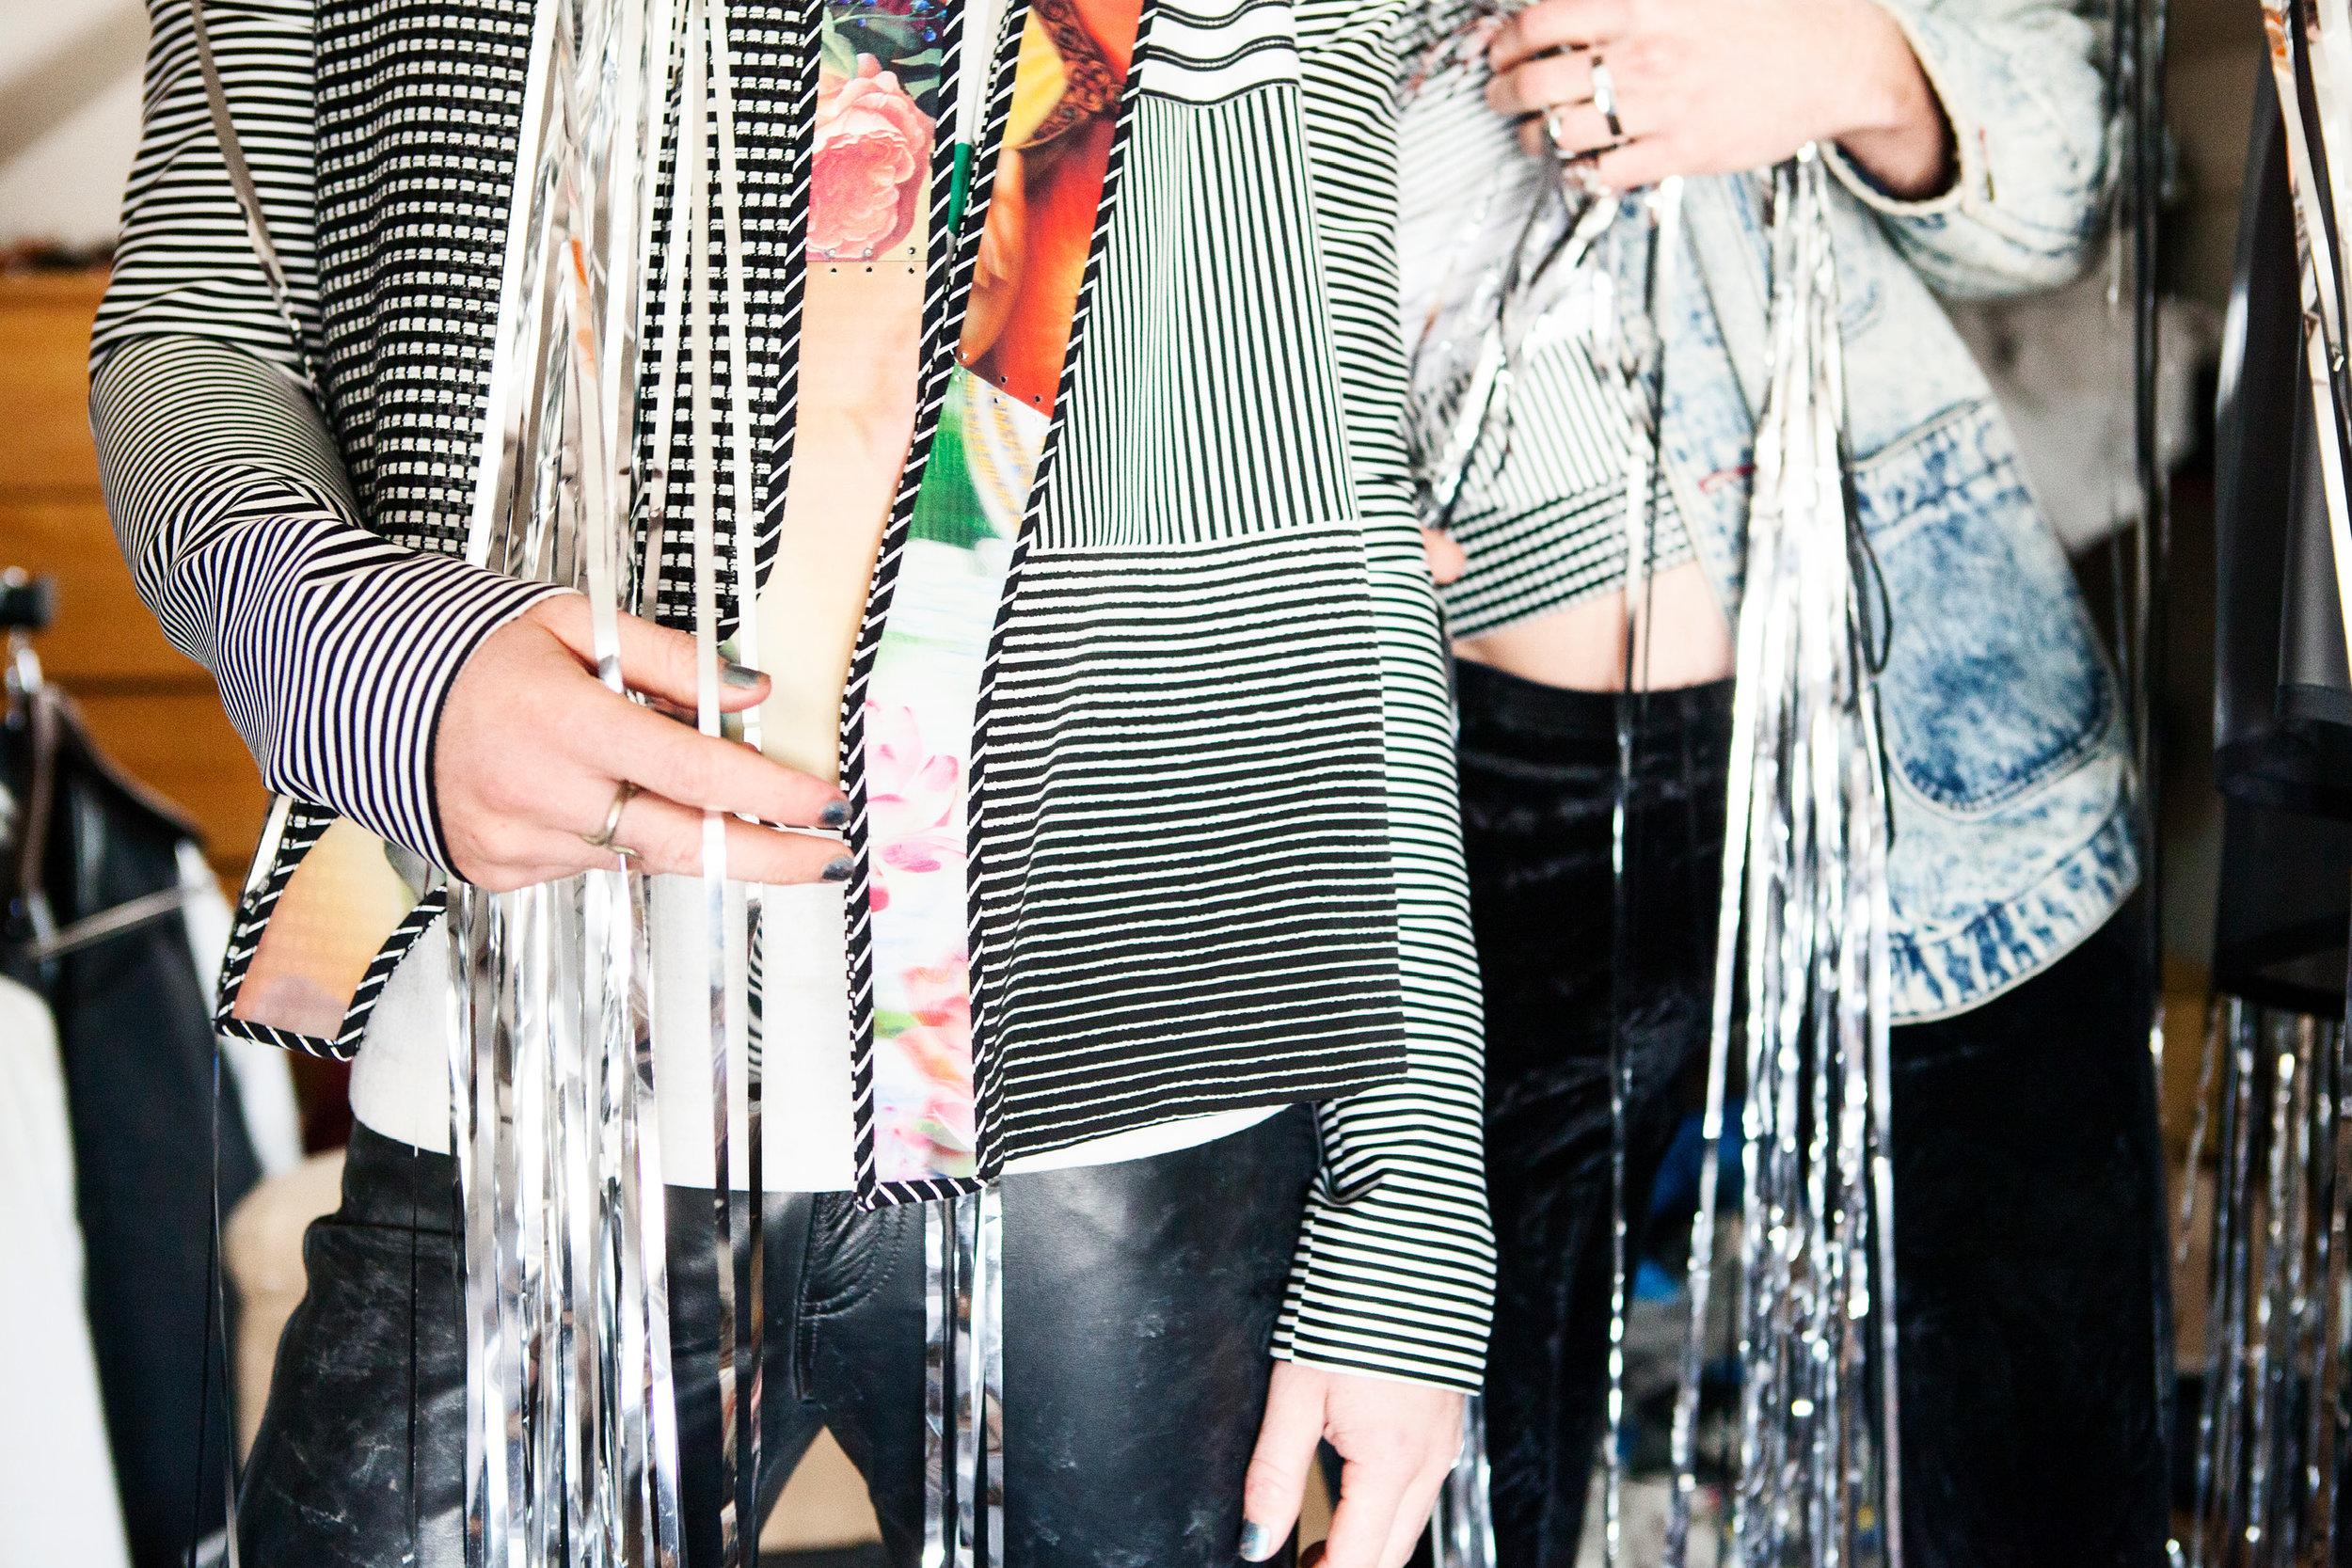 on Nathaniel: Jacket by Gaia Giladi, BFA Fashion Design. Pants and t-shirt, band's own. on Nick: Shirt by Gaia Giladi, BFA Fashion Design. Jacket, band's own. Pants by Cherng-Hann Lee, BFA Menswear Design.